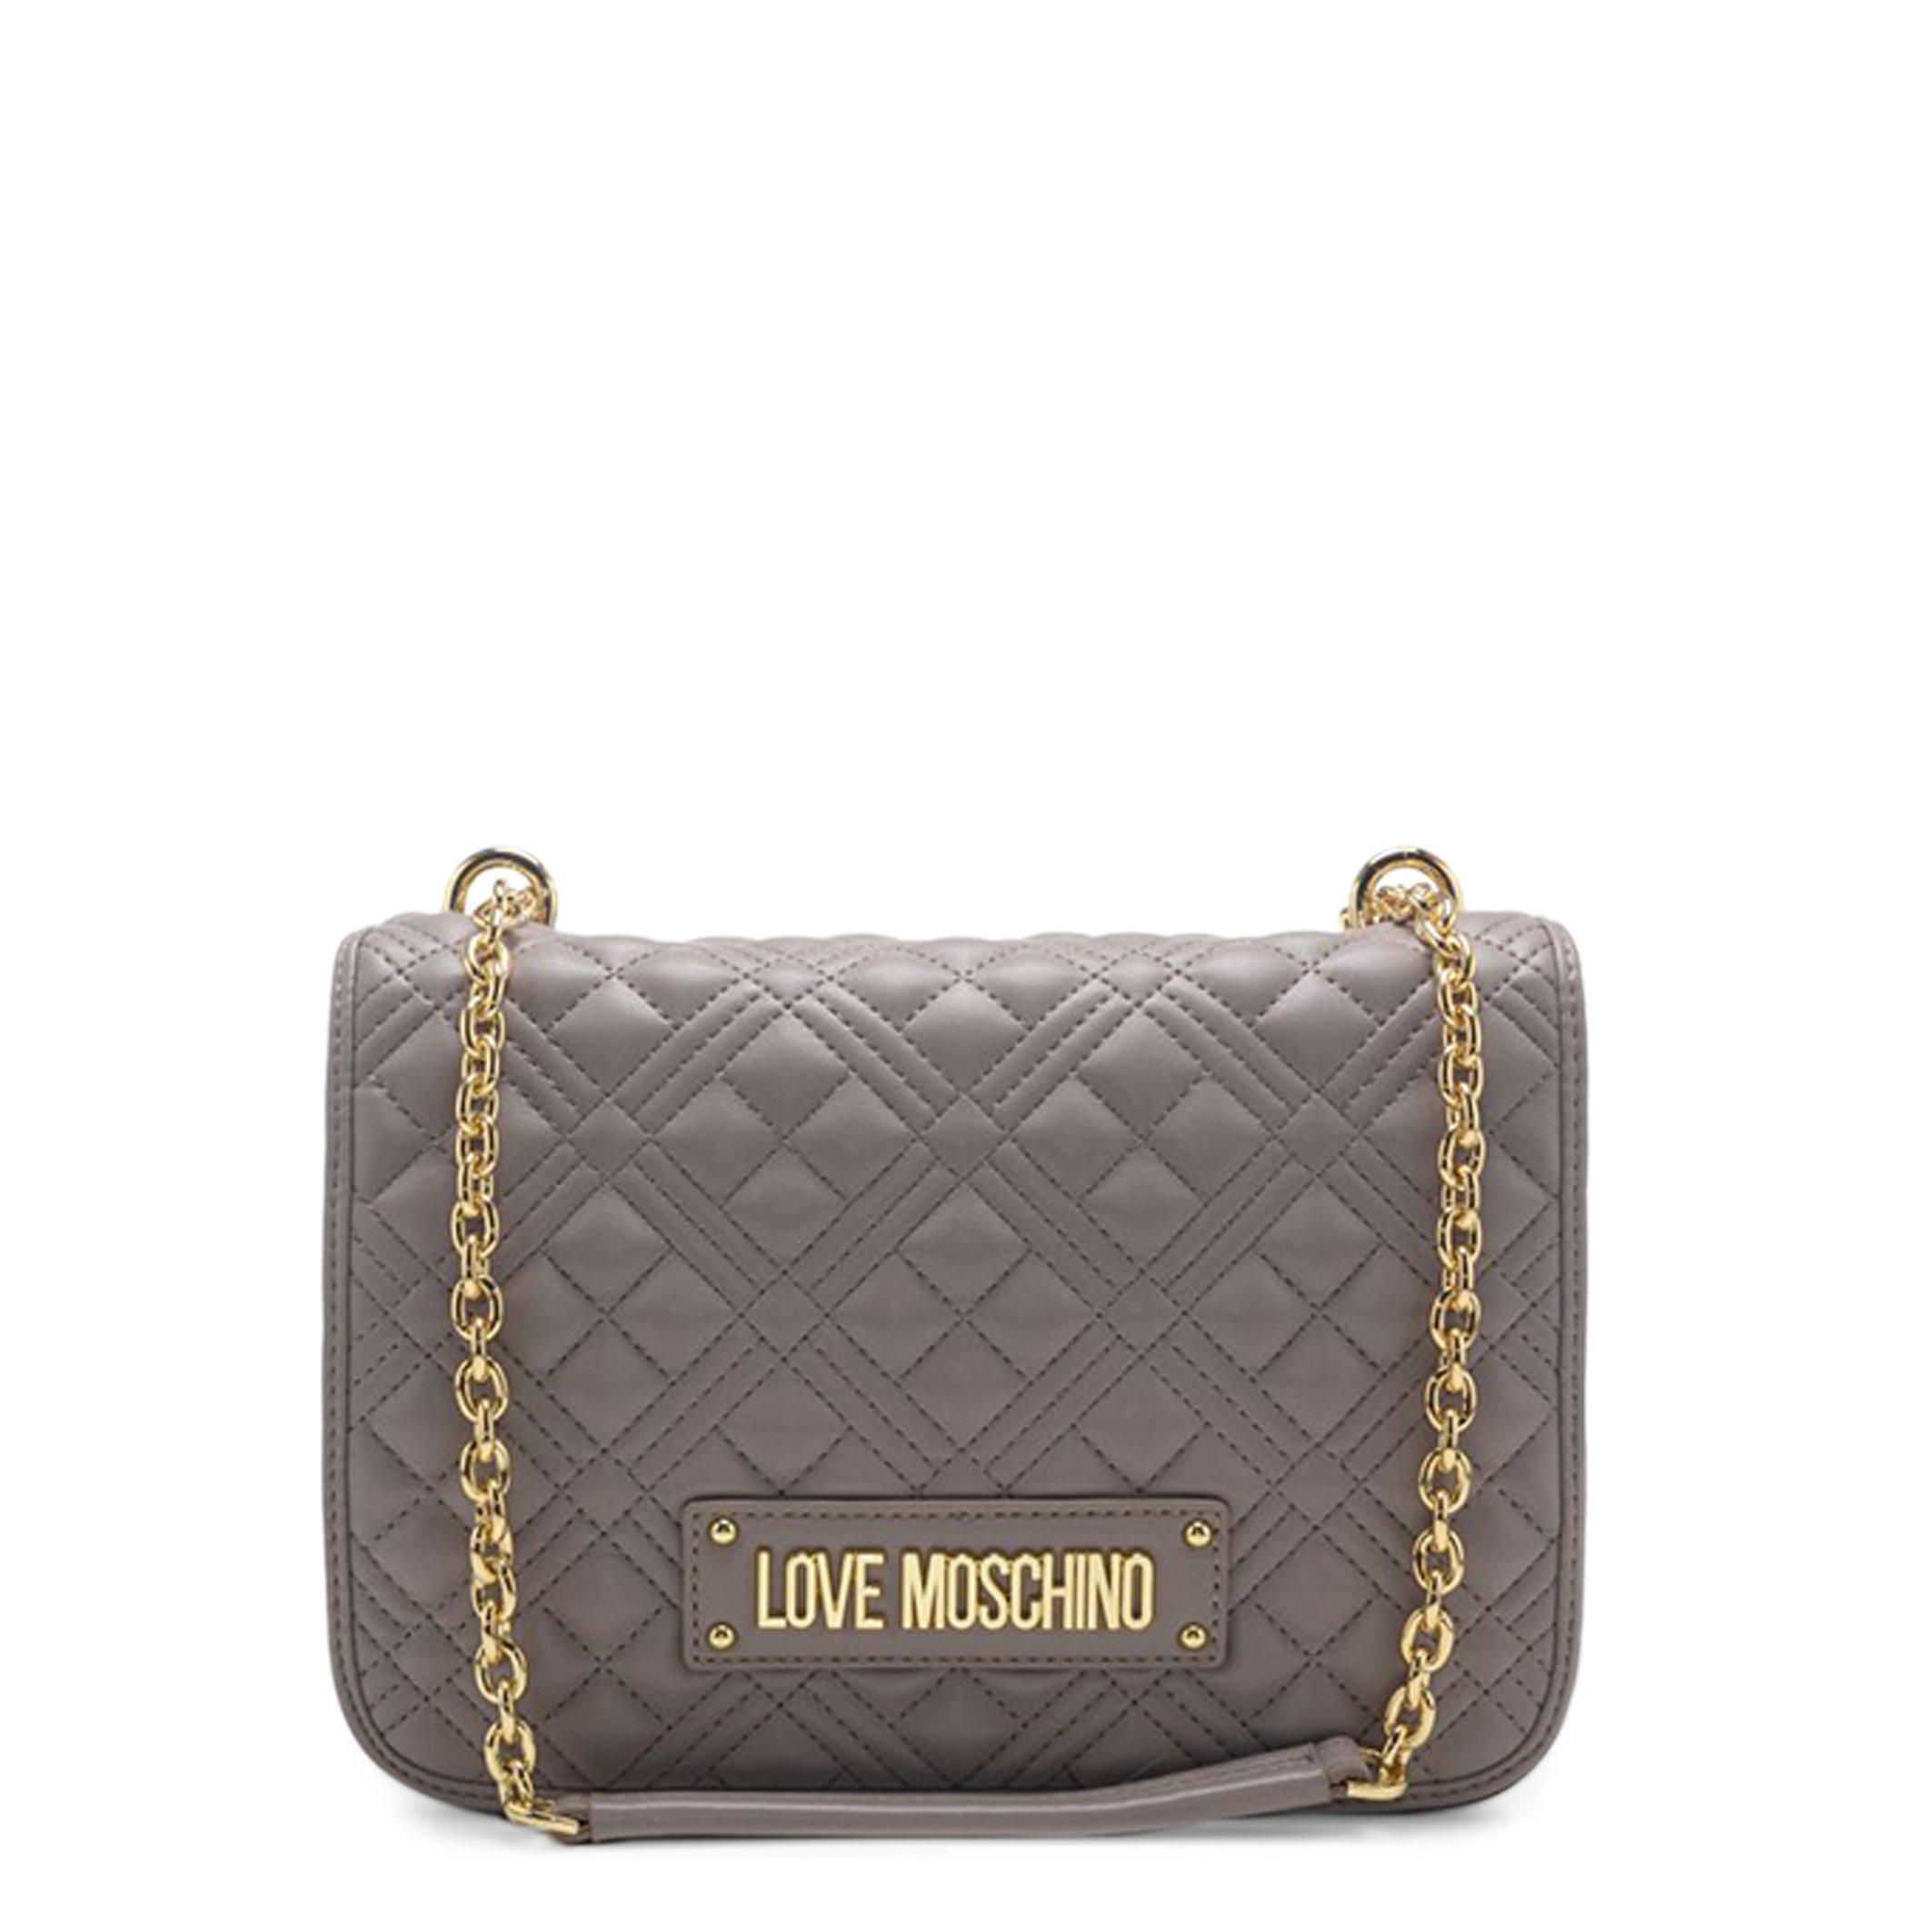 Love Moschino Women's Shoulder Bag Various Colours JC4000PP1DLA0 - grey NOSIZE